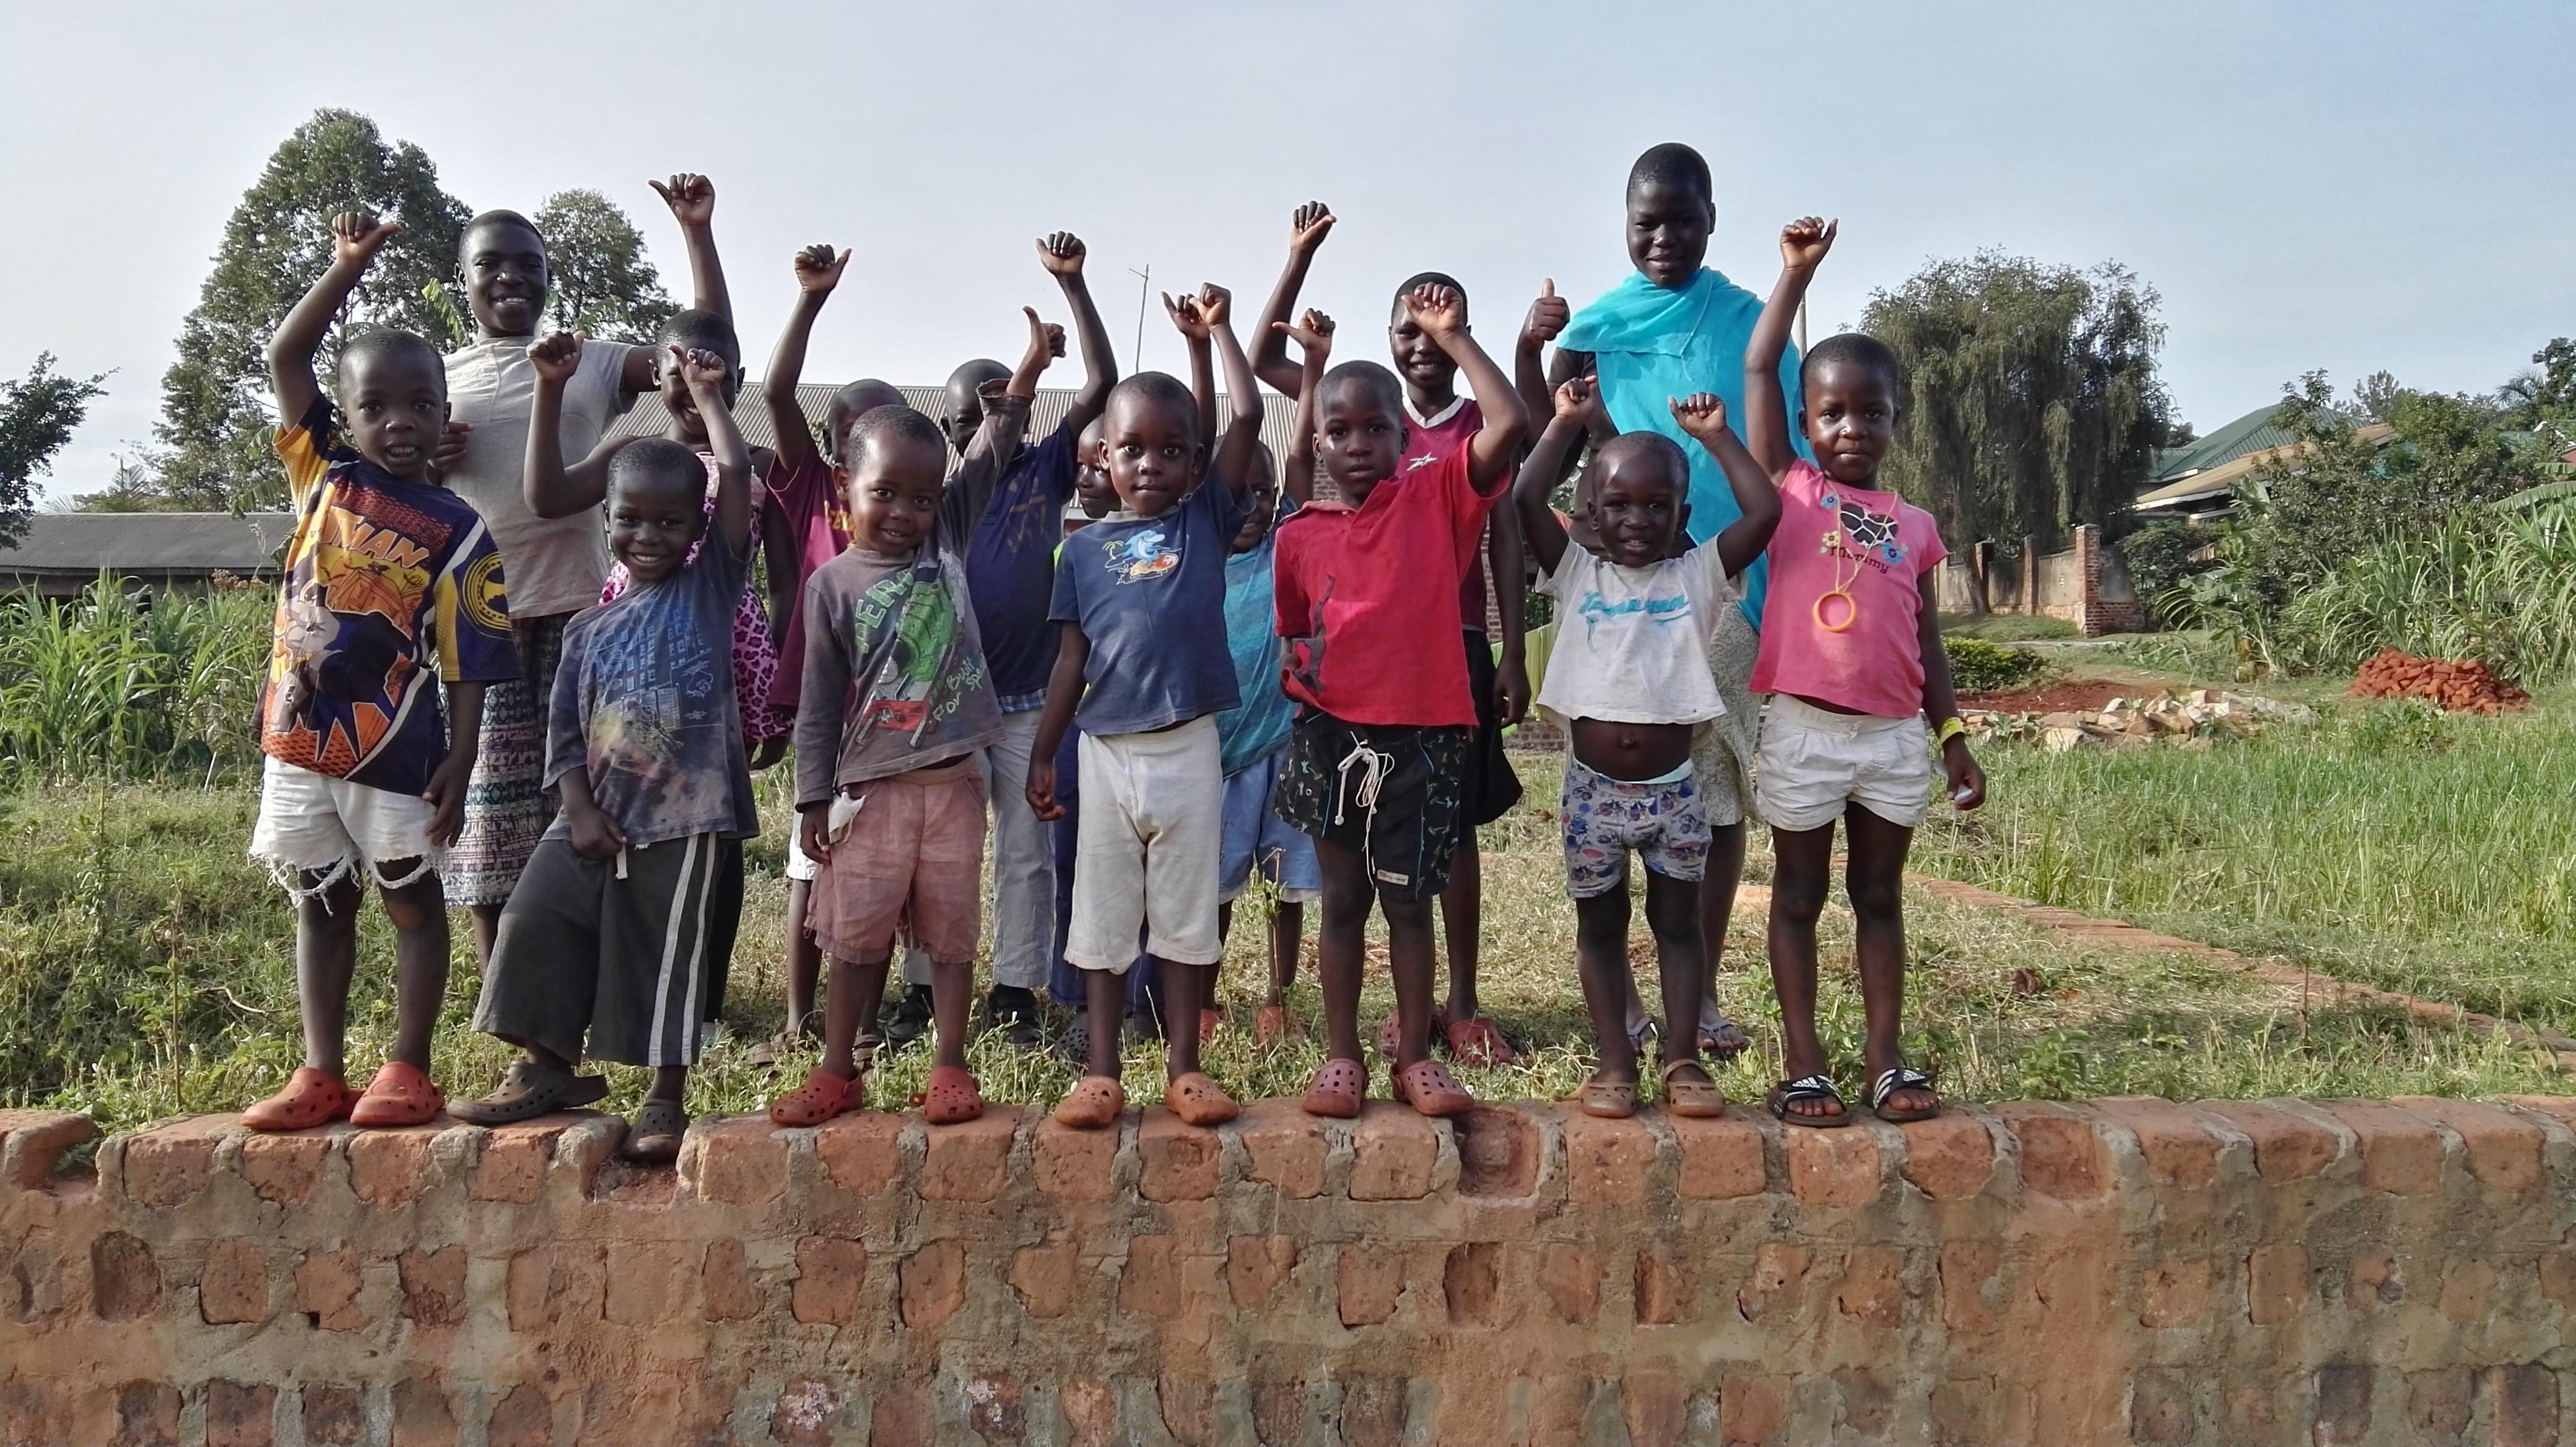 healthy-children-at-uganda-orphanage